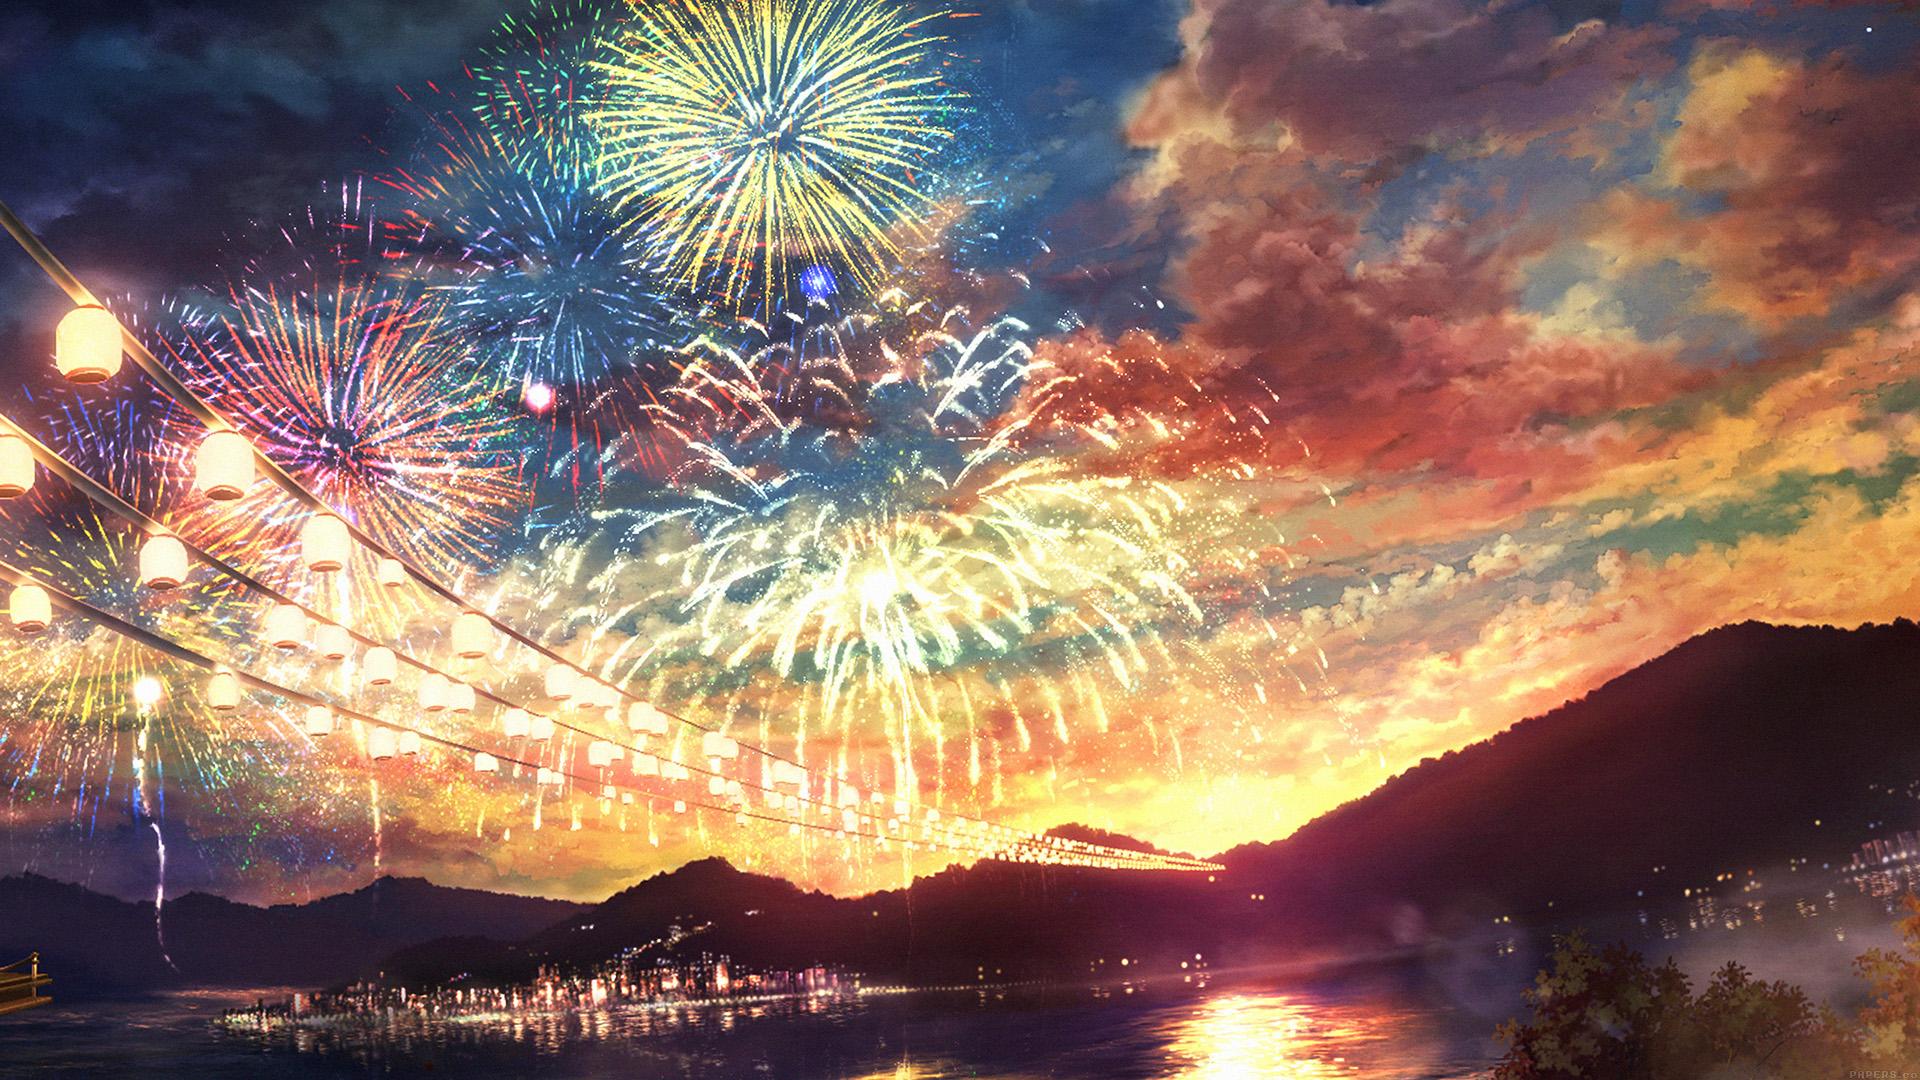 Wallpaper for desktop laptop ah44 firework dark night - Anime scenery wallpaper laptop ...